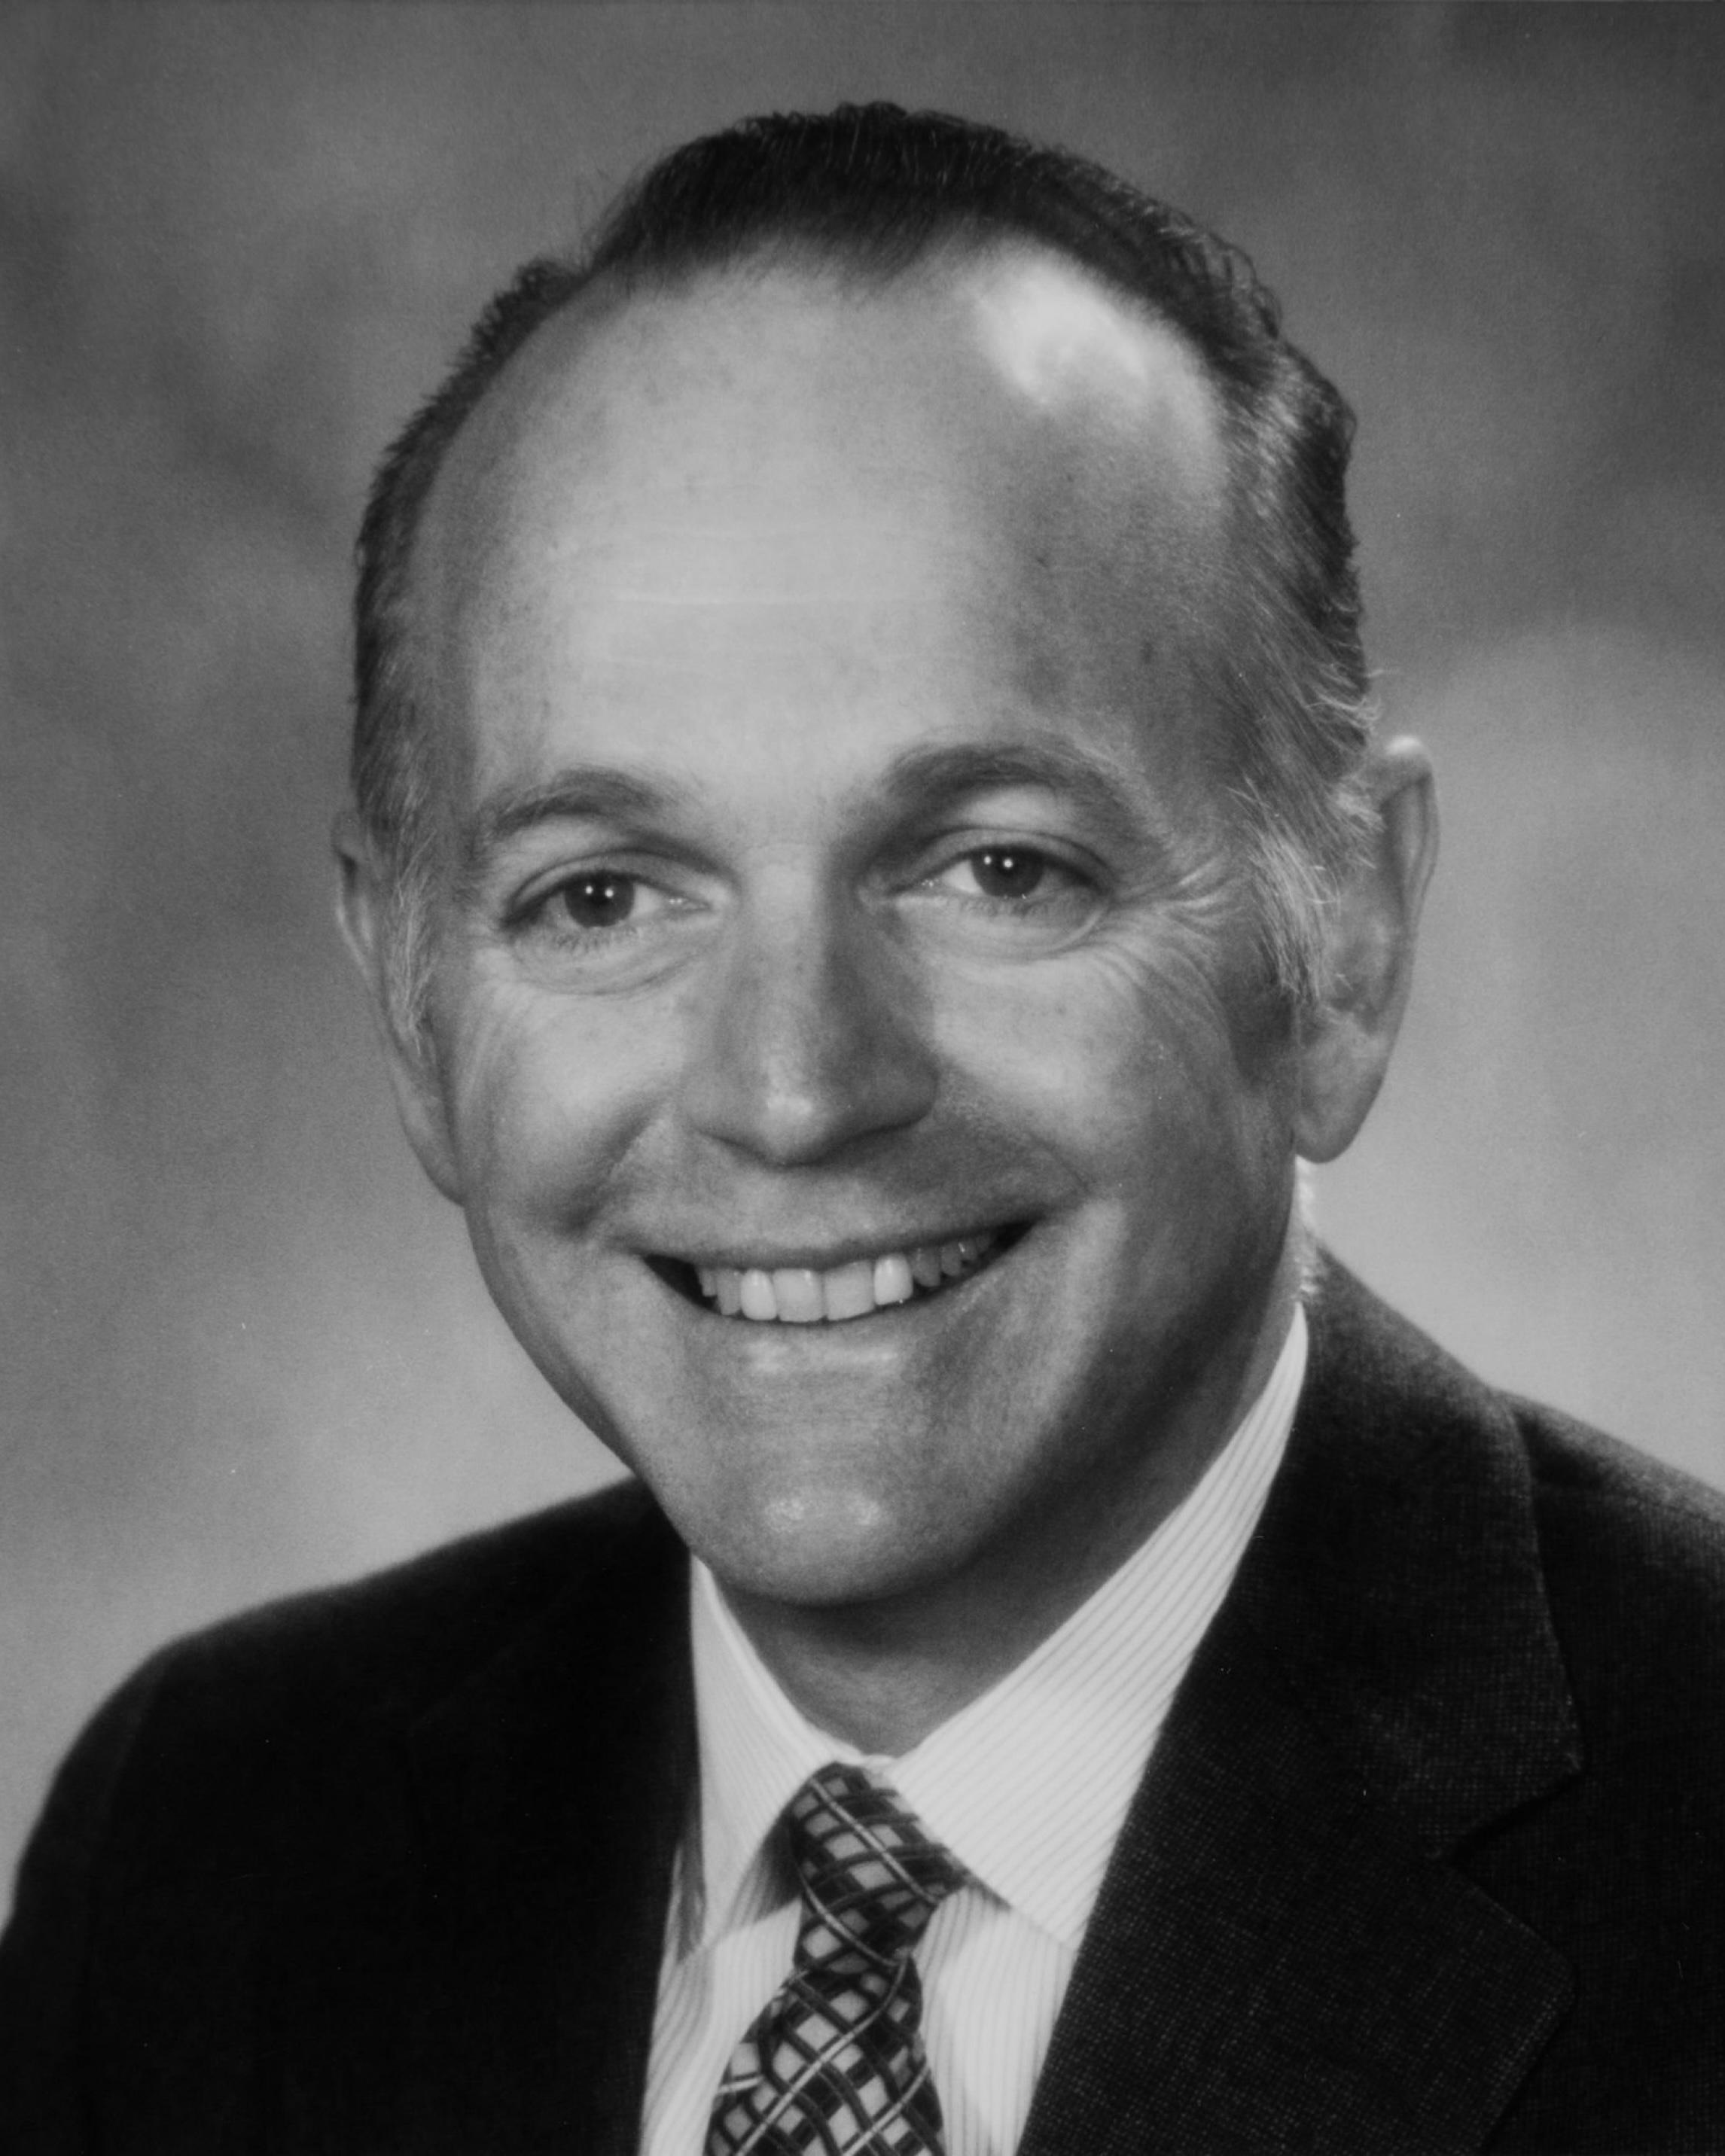 1988 United States Senate election in Arizona